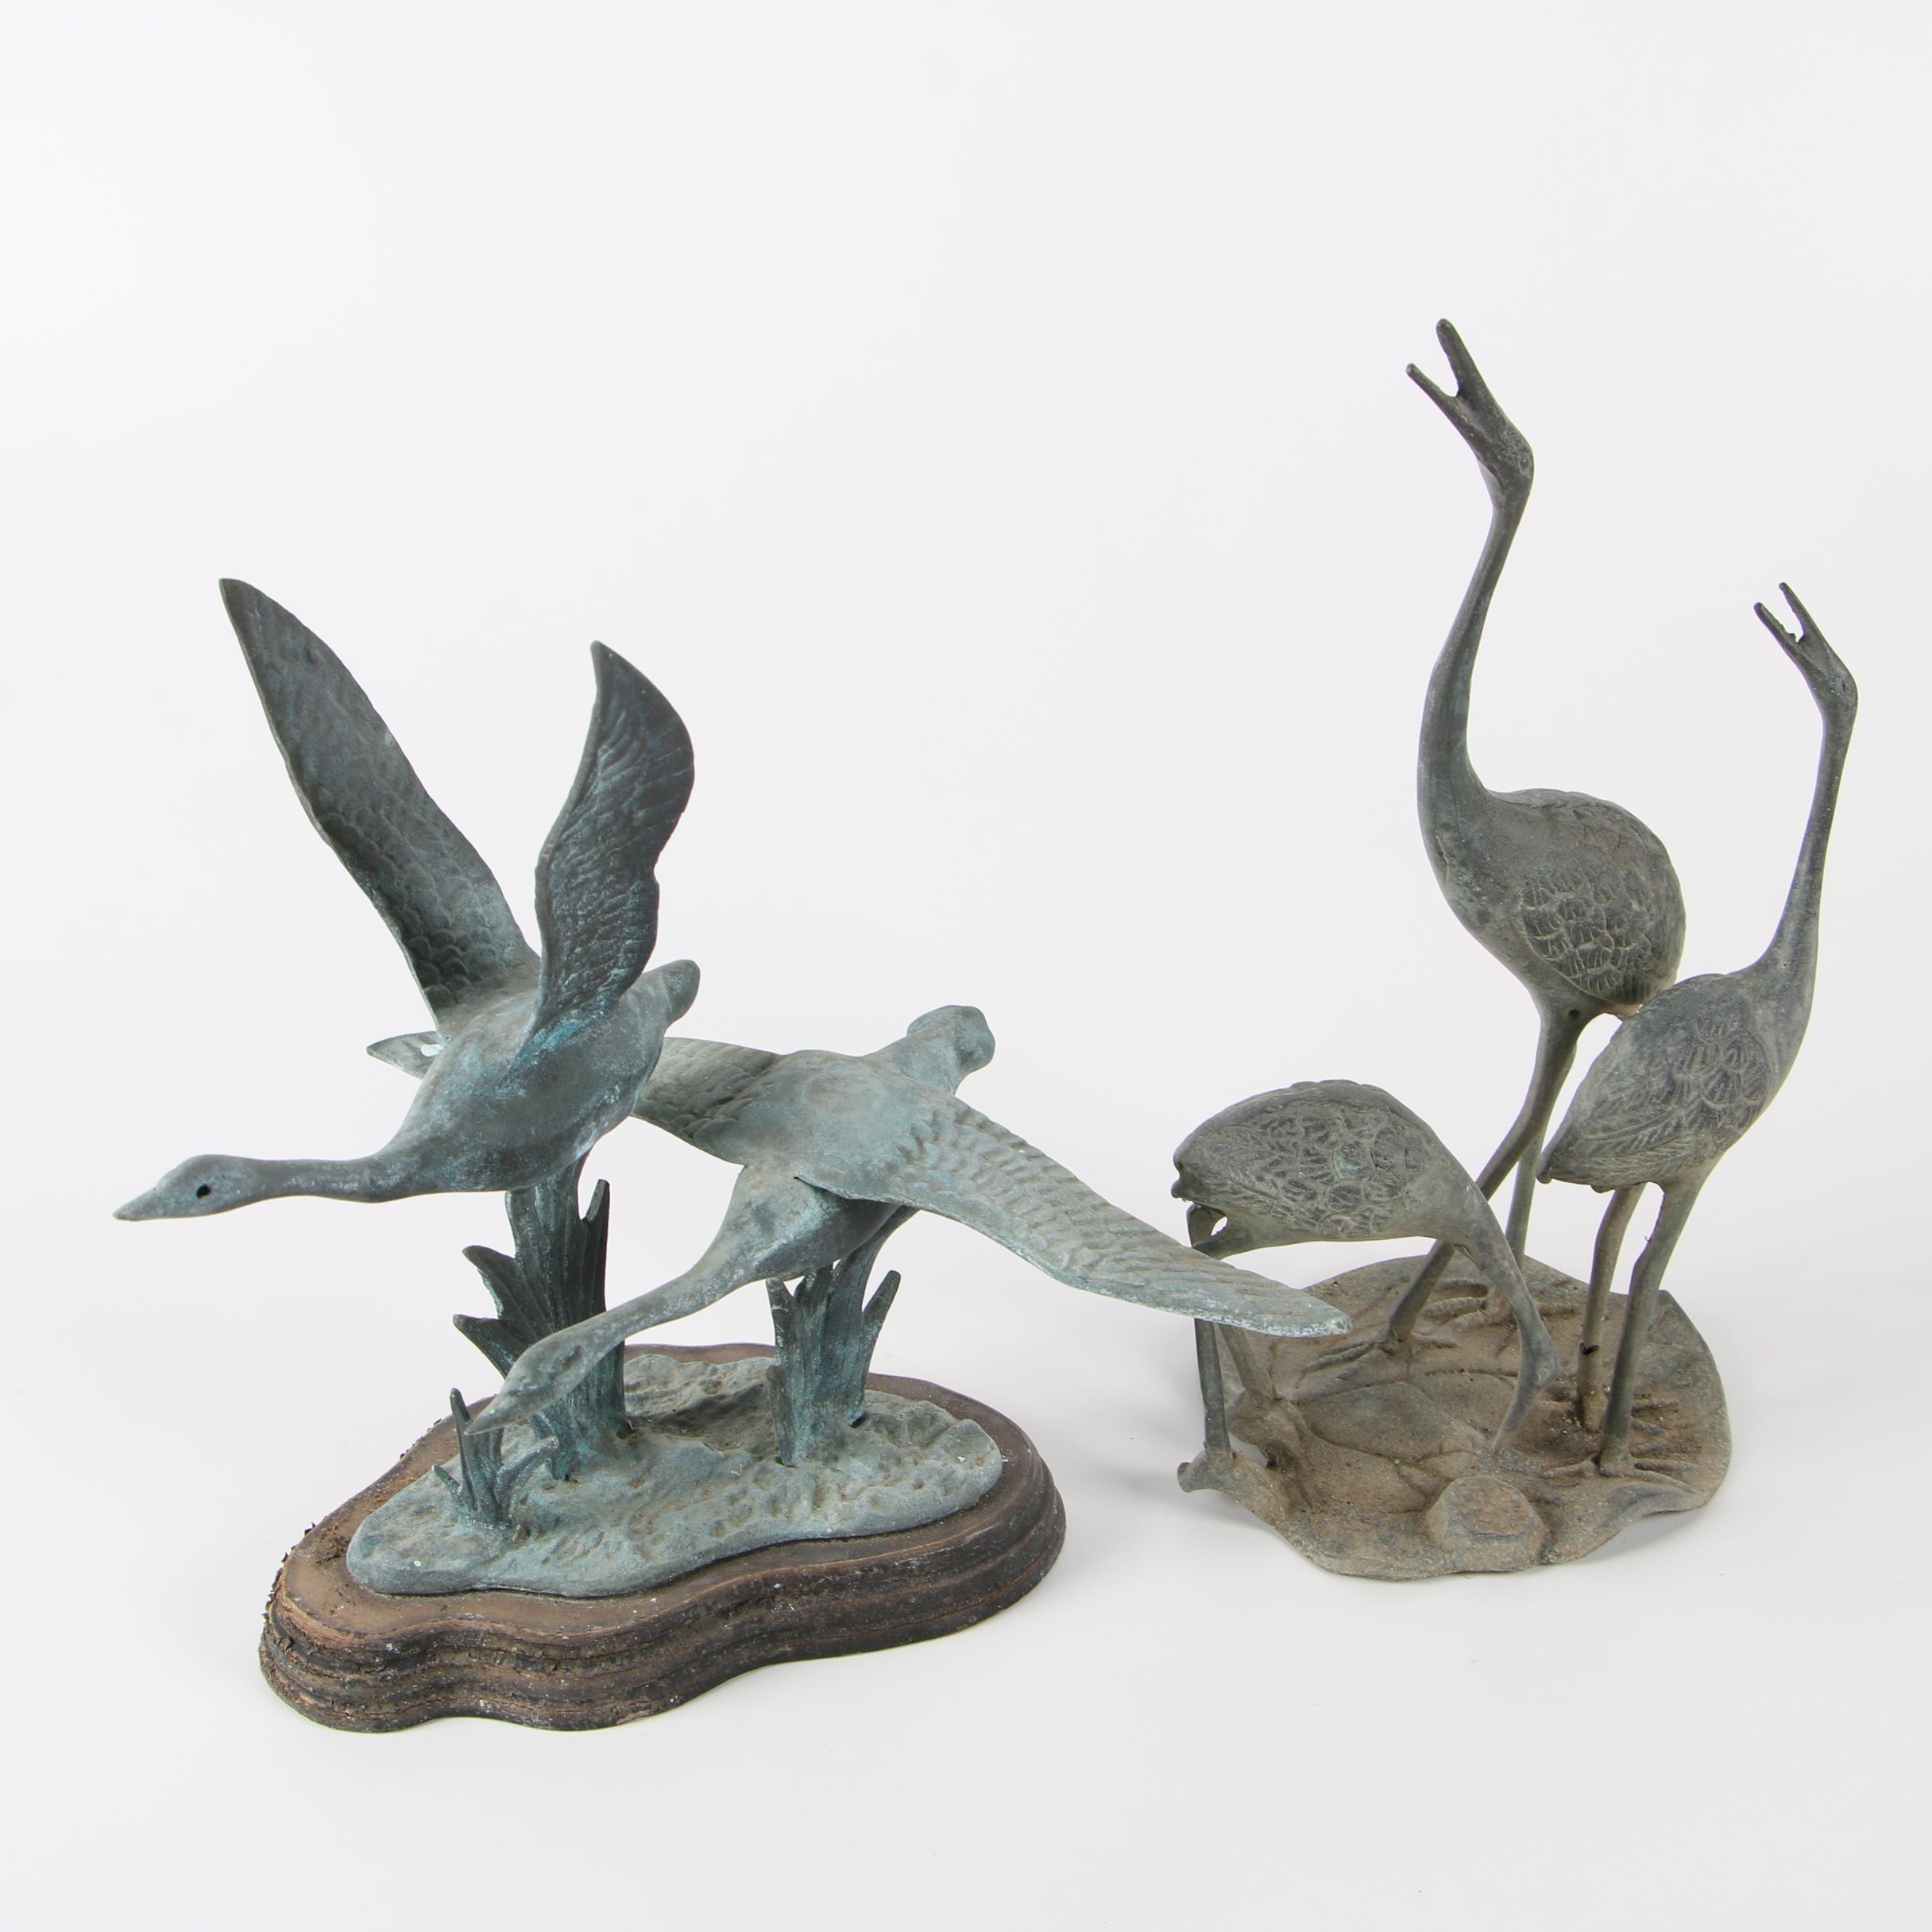 Vintage Metal Crane and Goose Sculptures